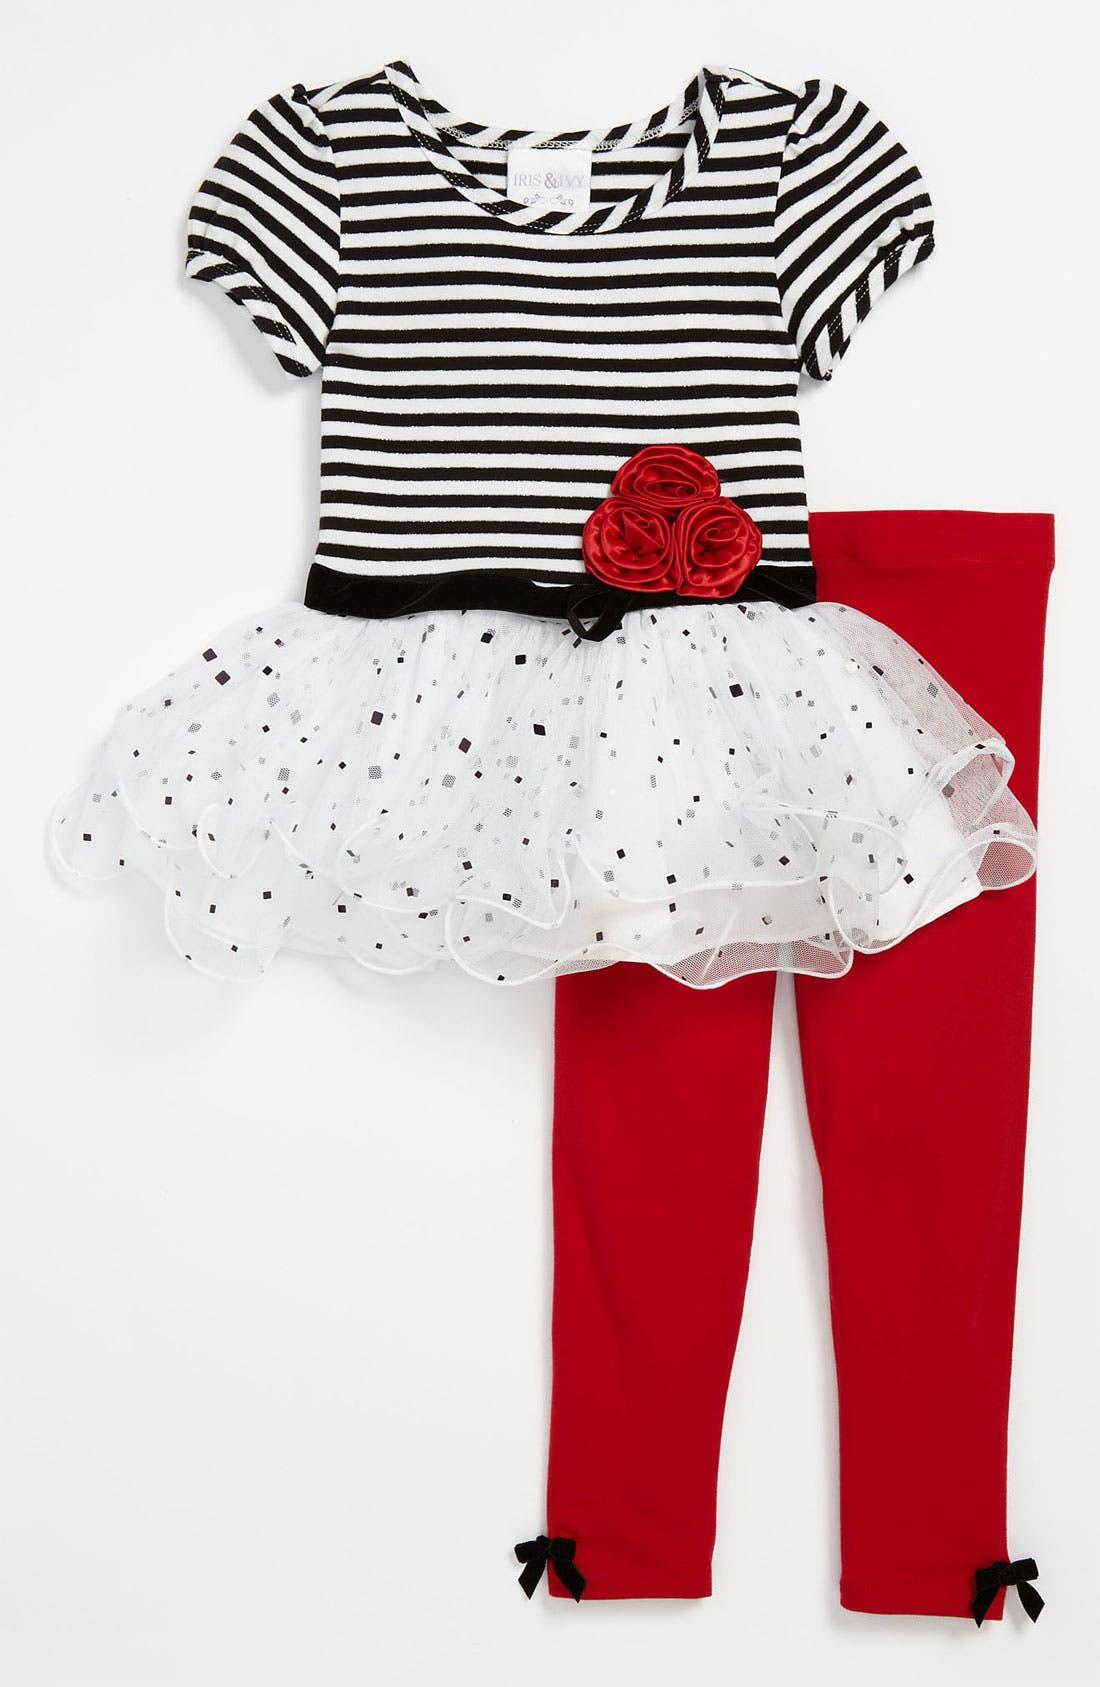 Alternate Image 1 Selected - Iris & Ivy Stripe Dress & Leggings (Toddler)